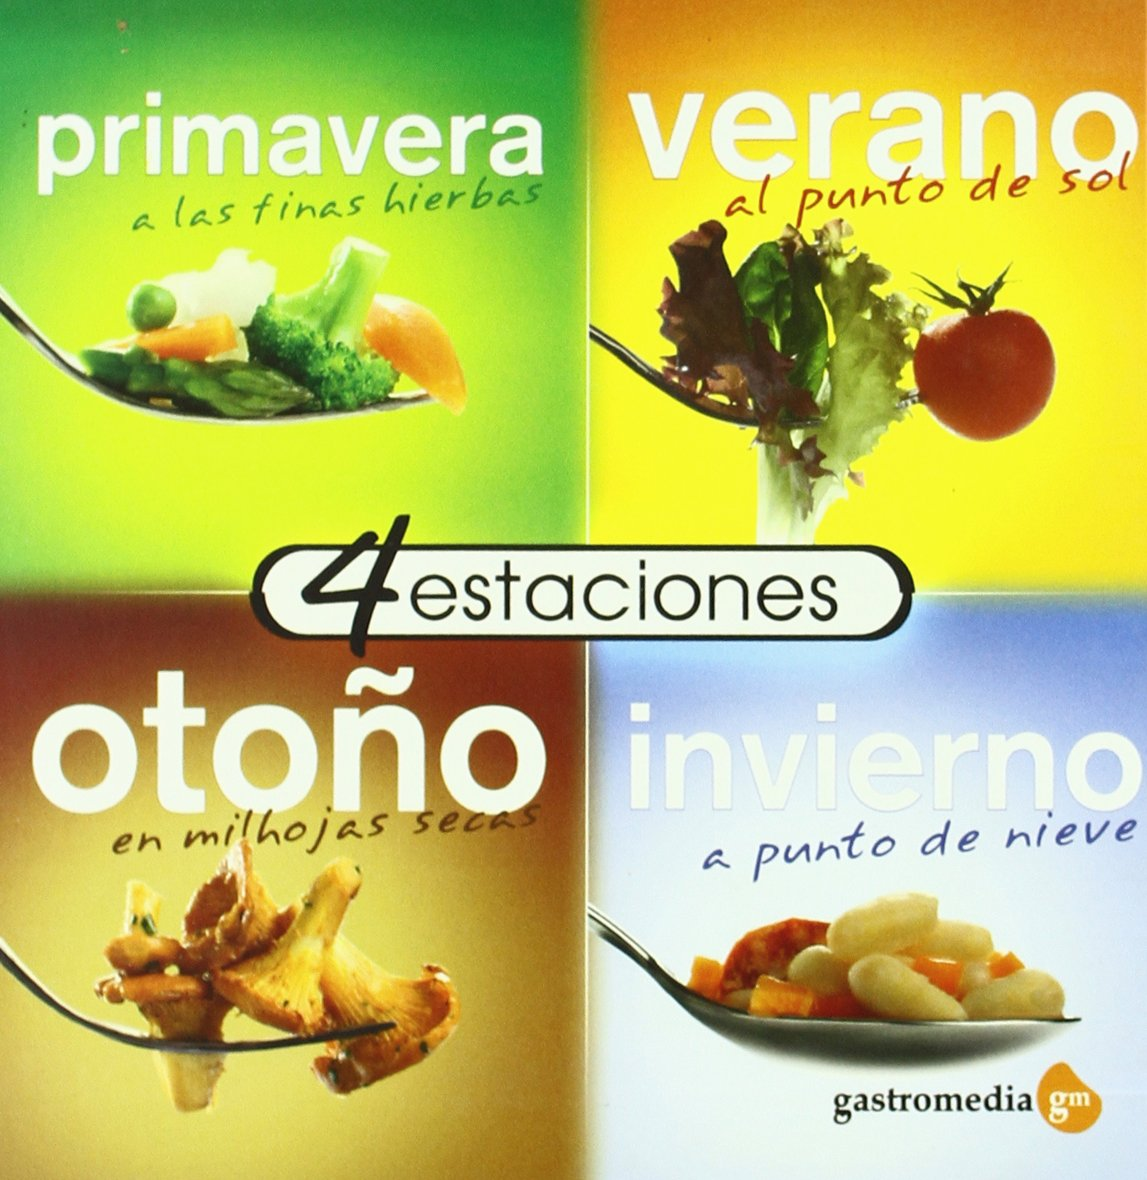 Pack 4 estaciones: primavera, verano, otono, invierno: Varios Autores: 9788493705497: Amazon.com: Books